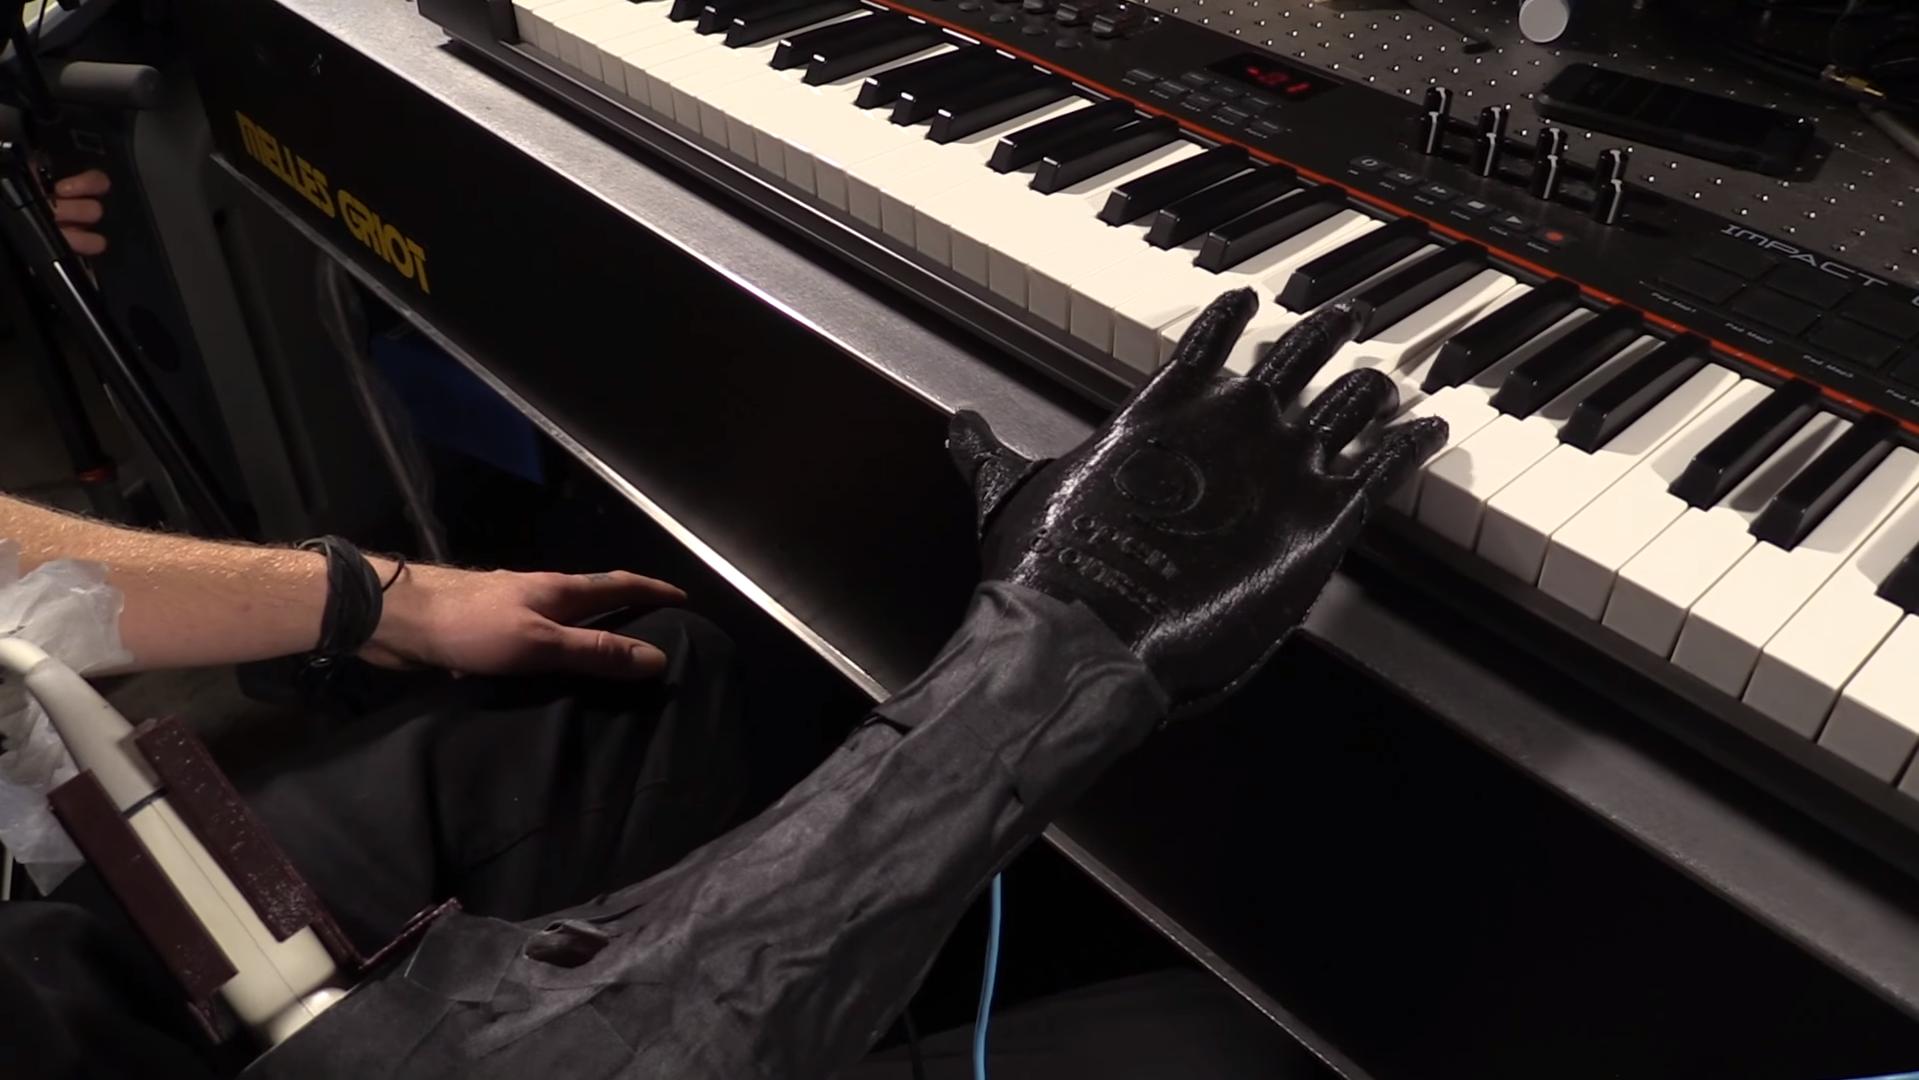 Amputee Musician Tests Luke Skywalker Hand | All3DP